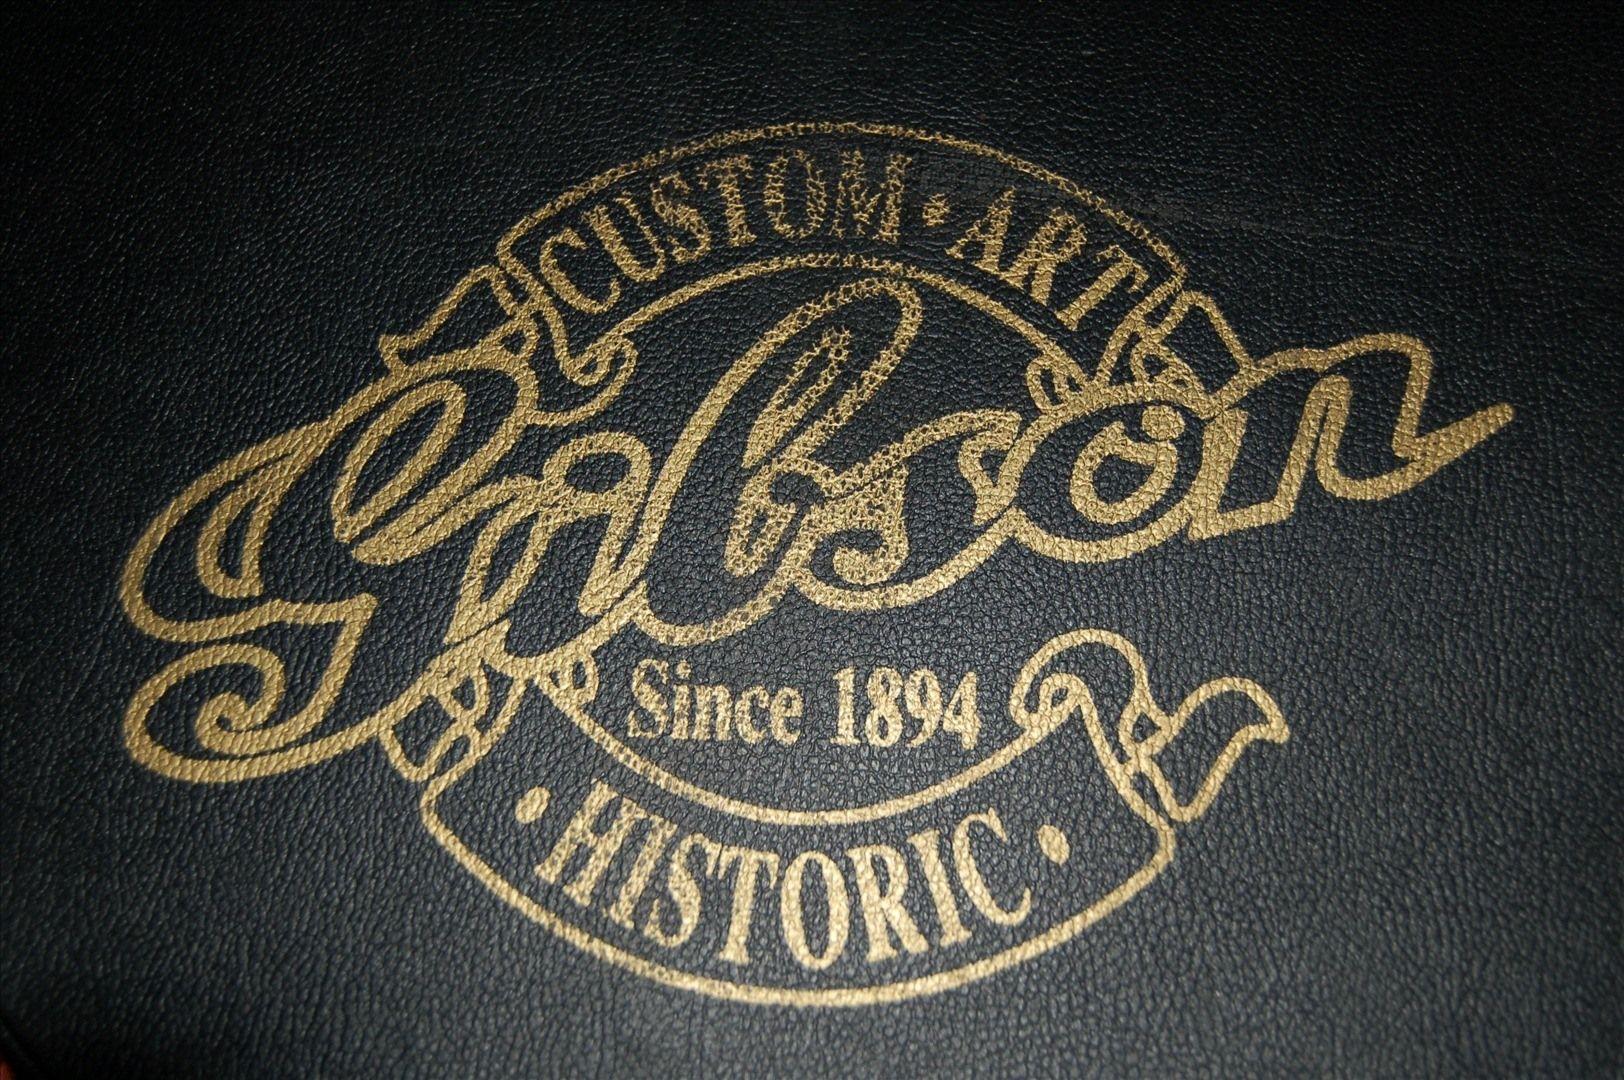 gibson guitar logo guitars and music guitar logo gibson guitars guitar. Black Bedroom Furniture Sets. Home Design Ideas